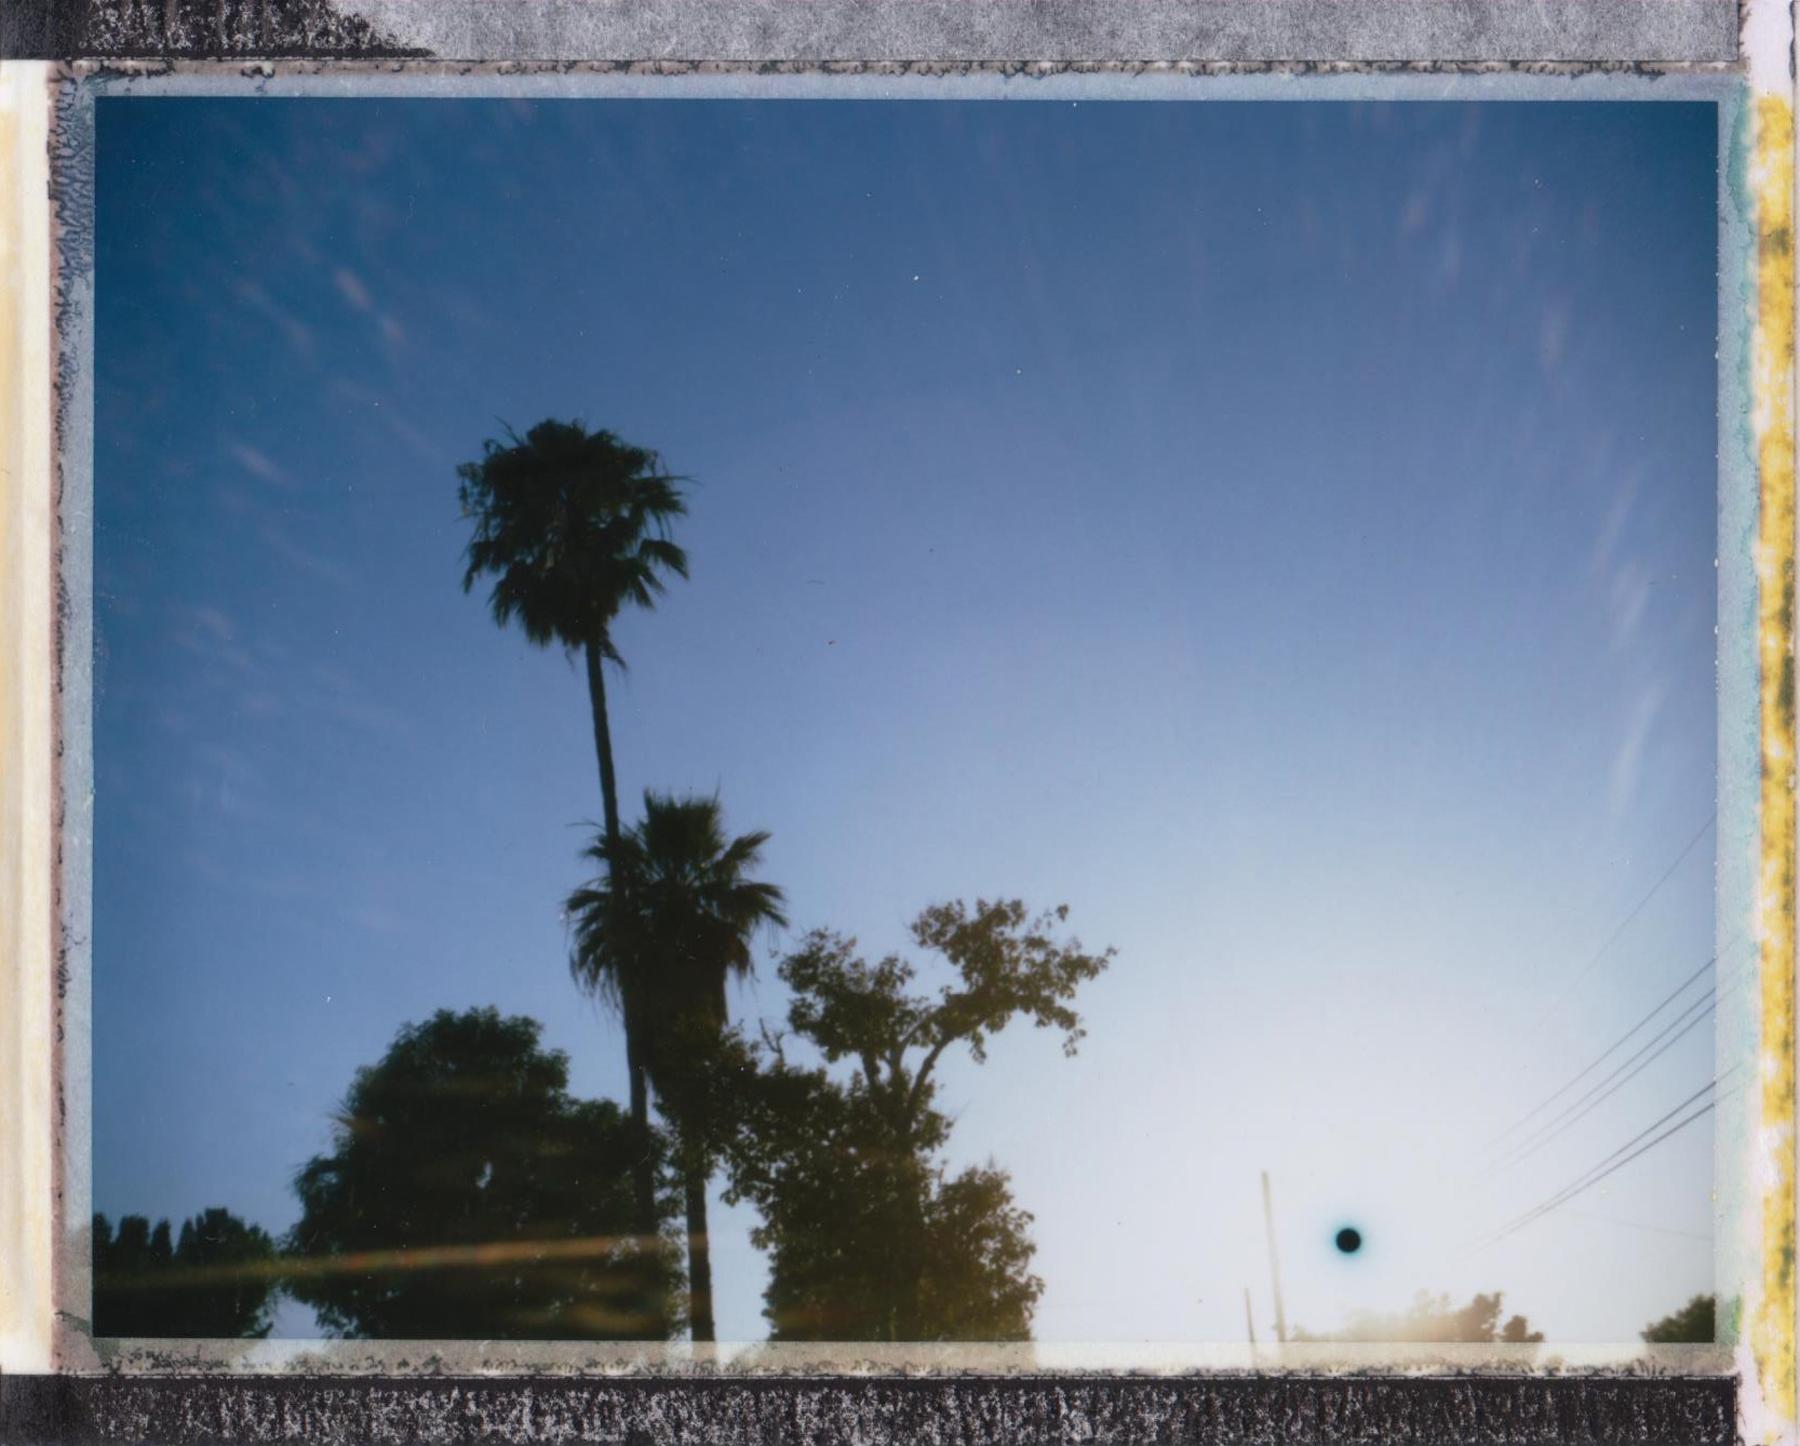 Sunset, Sylmar, California